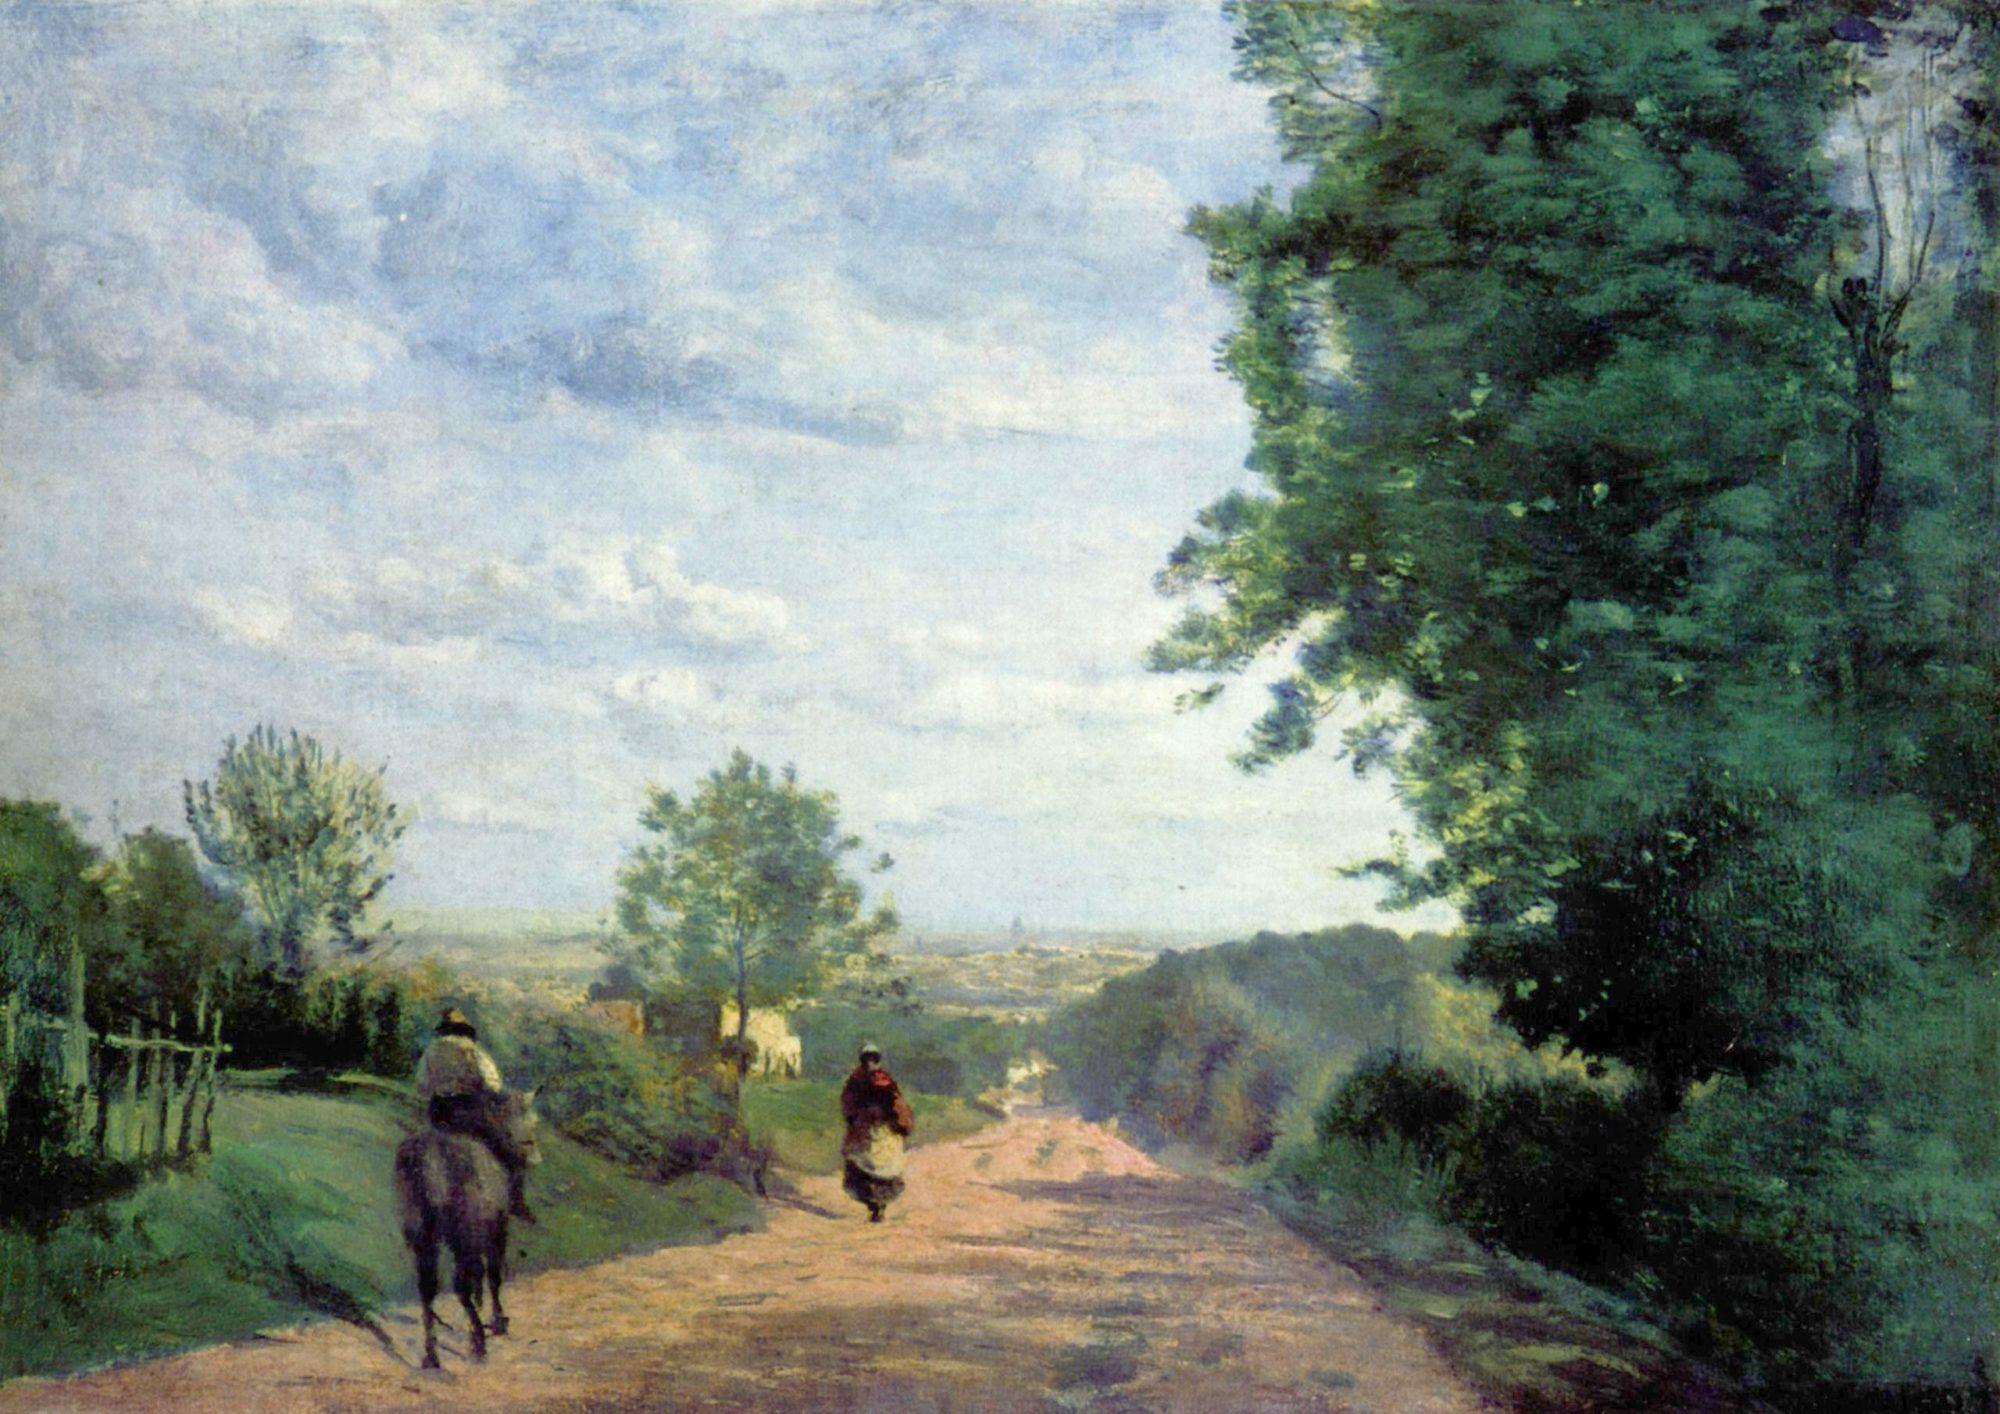 Camille Corot, Weg nach Paris, gemalt 1865. Vermisst seit dem Diebstahl aus dem Louvre am 3. Mai 1998